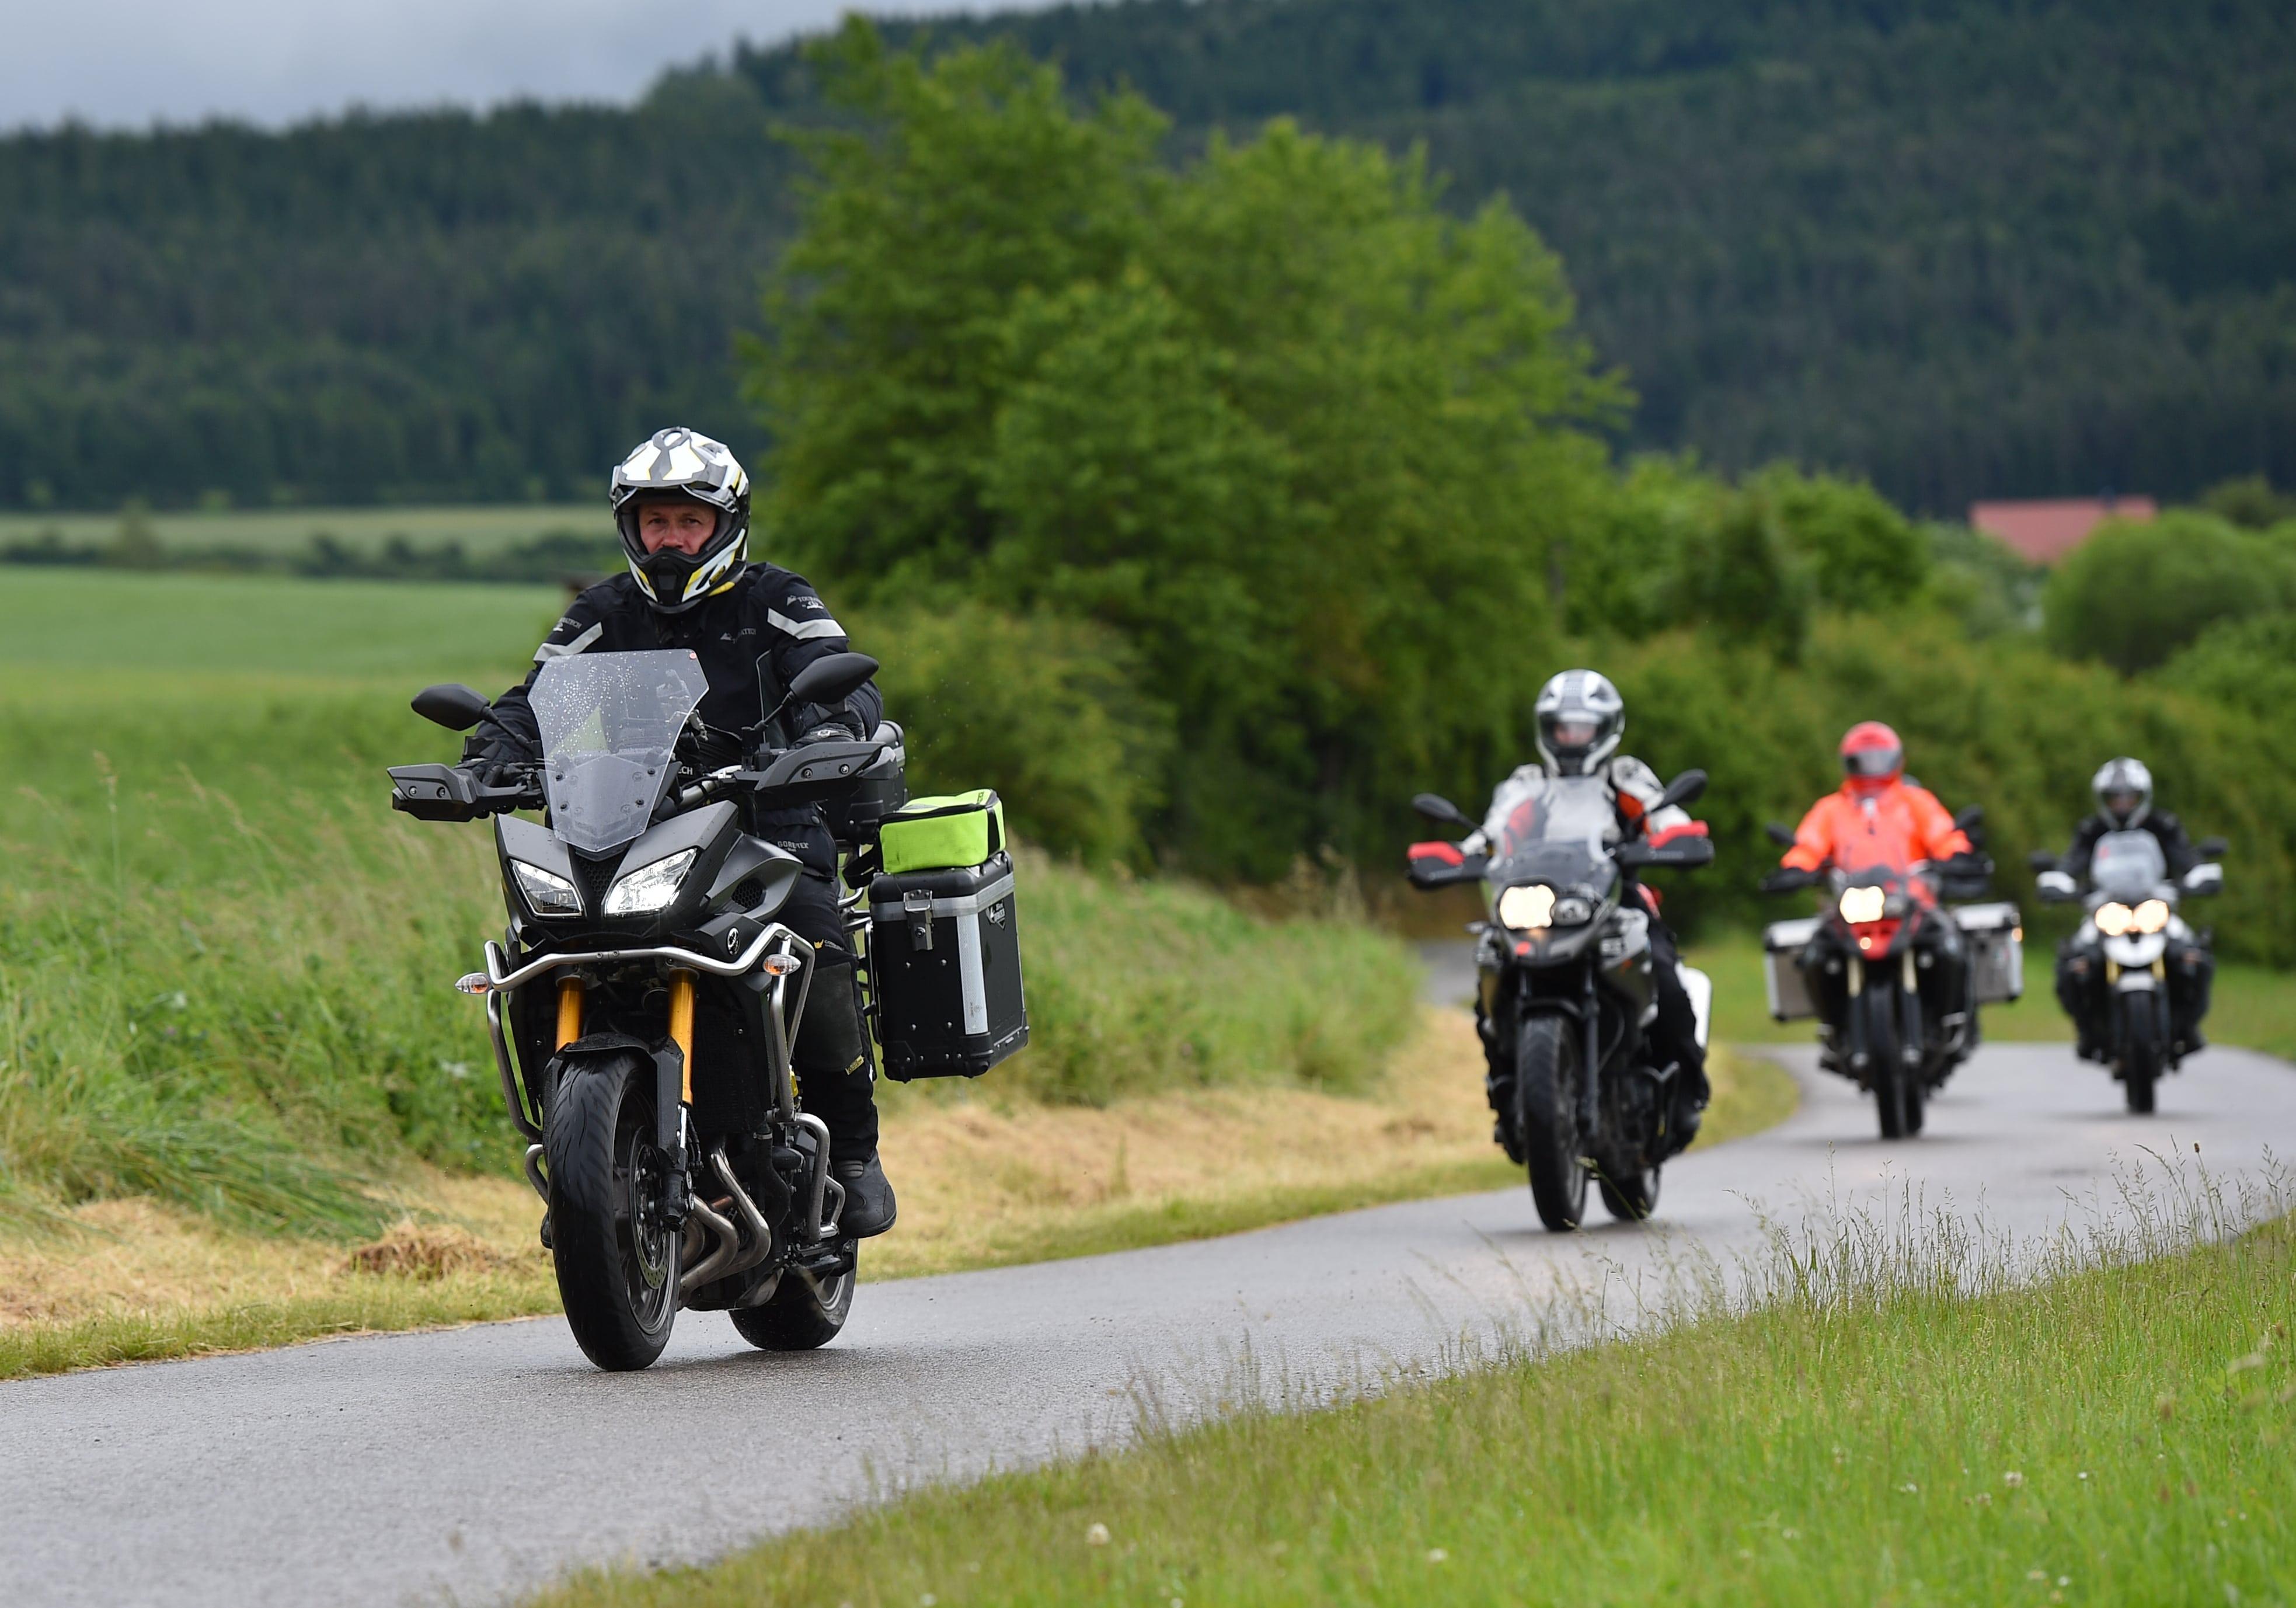 Motorrad Events von Good Souls